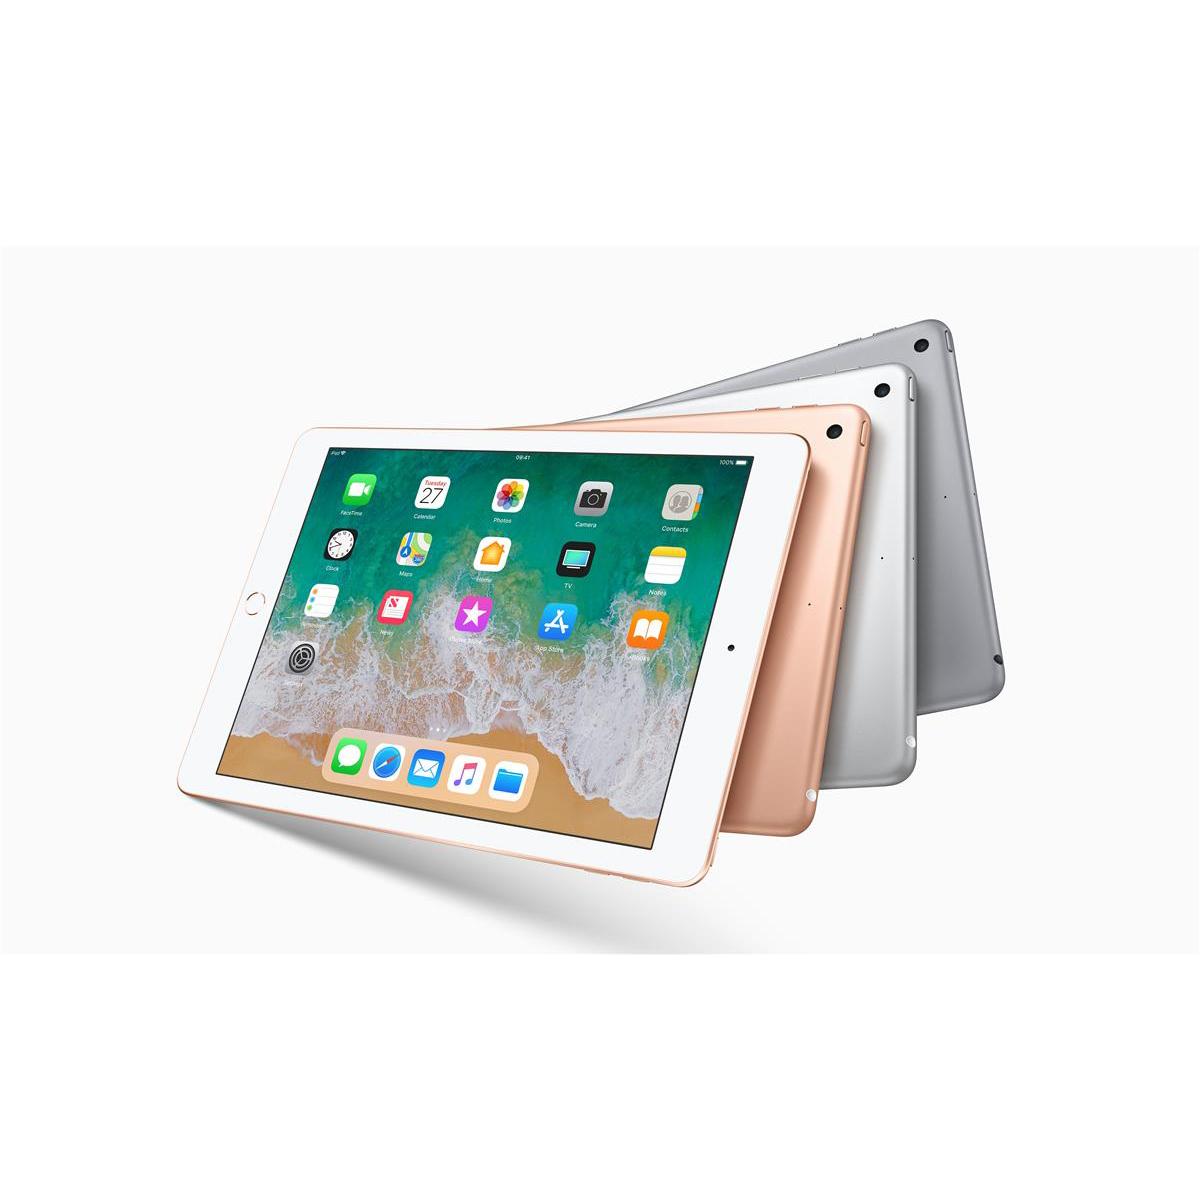 Apple iPad Cellular Wi-Fi 32GB 8Mp Camera Touch ID Space Grey Ref MP242B/A